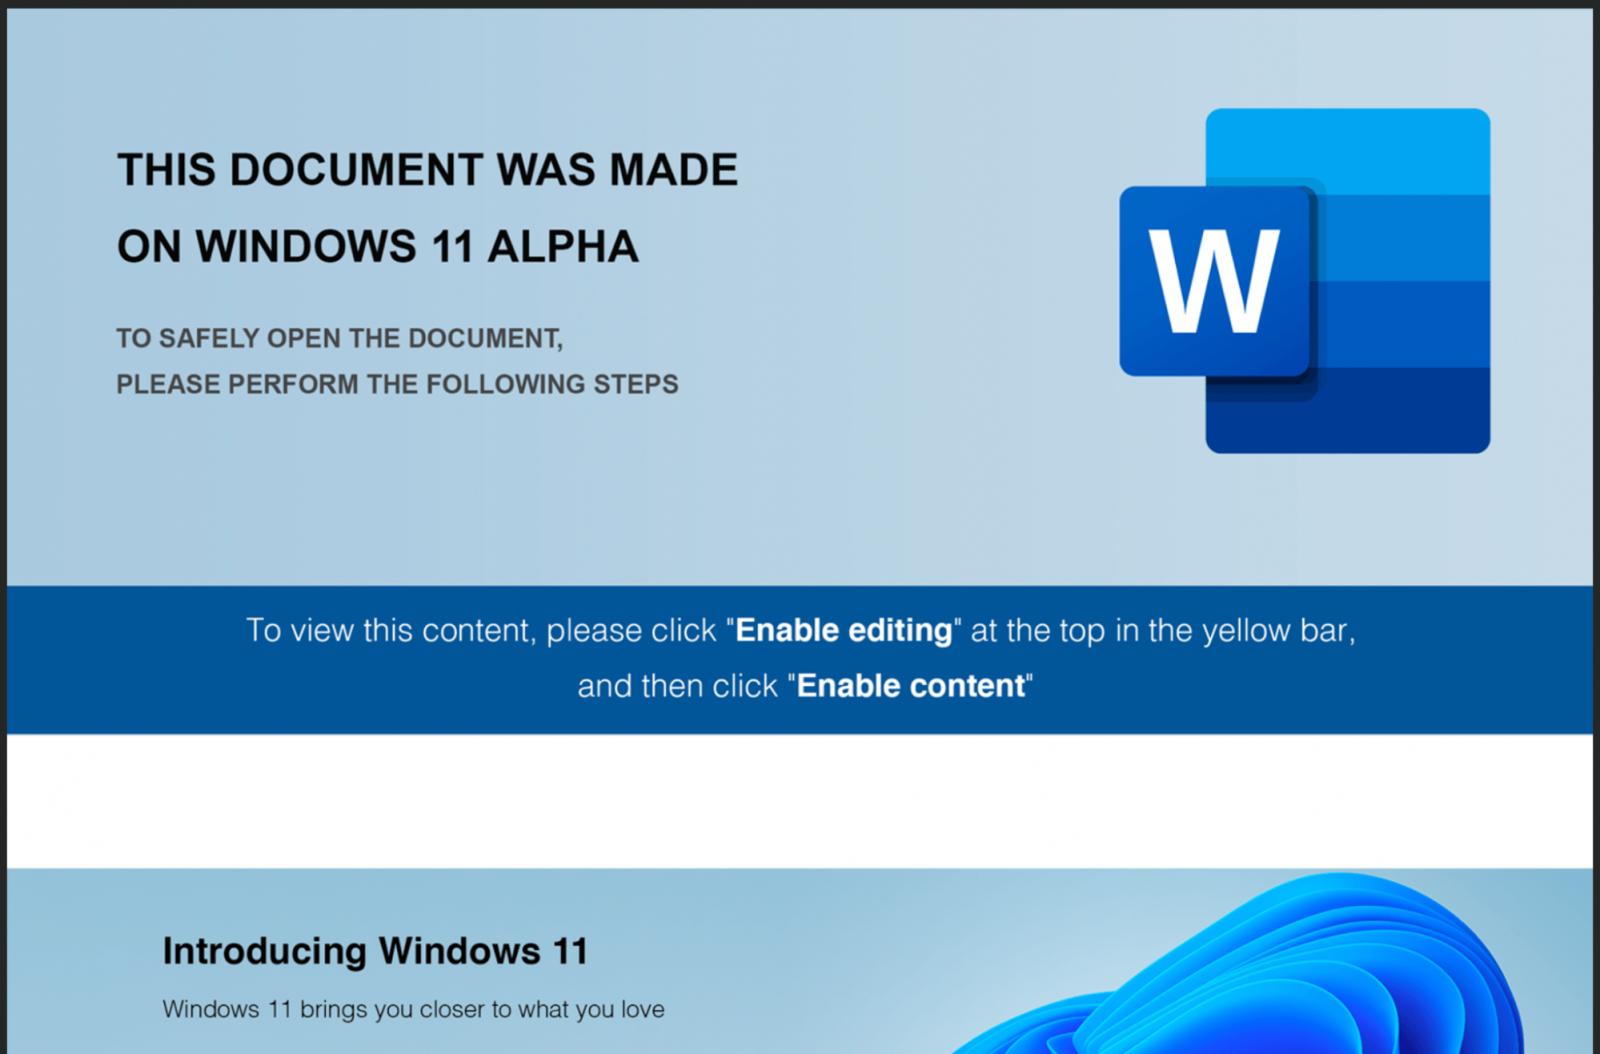 Windows 11-themed maldoc